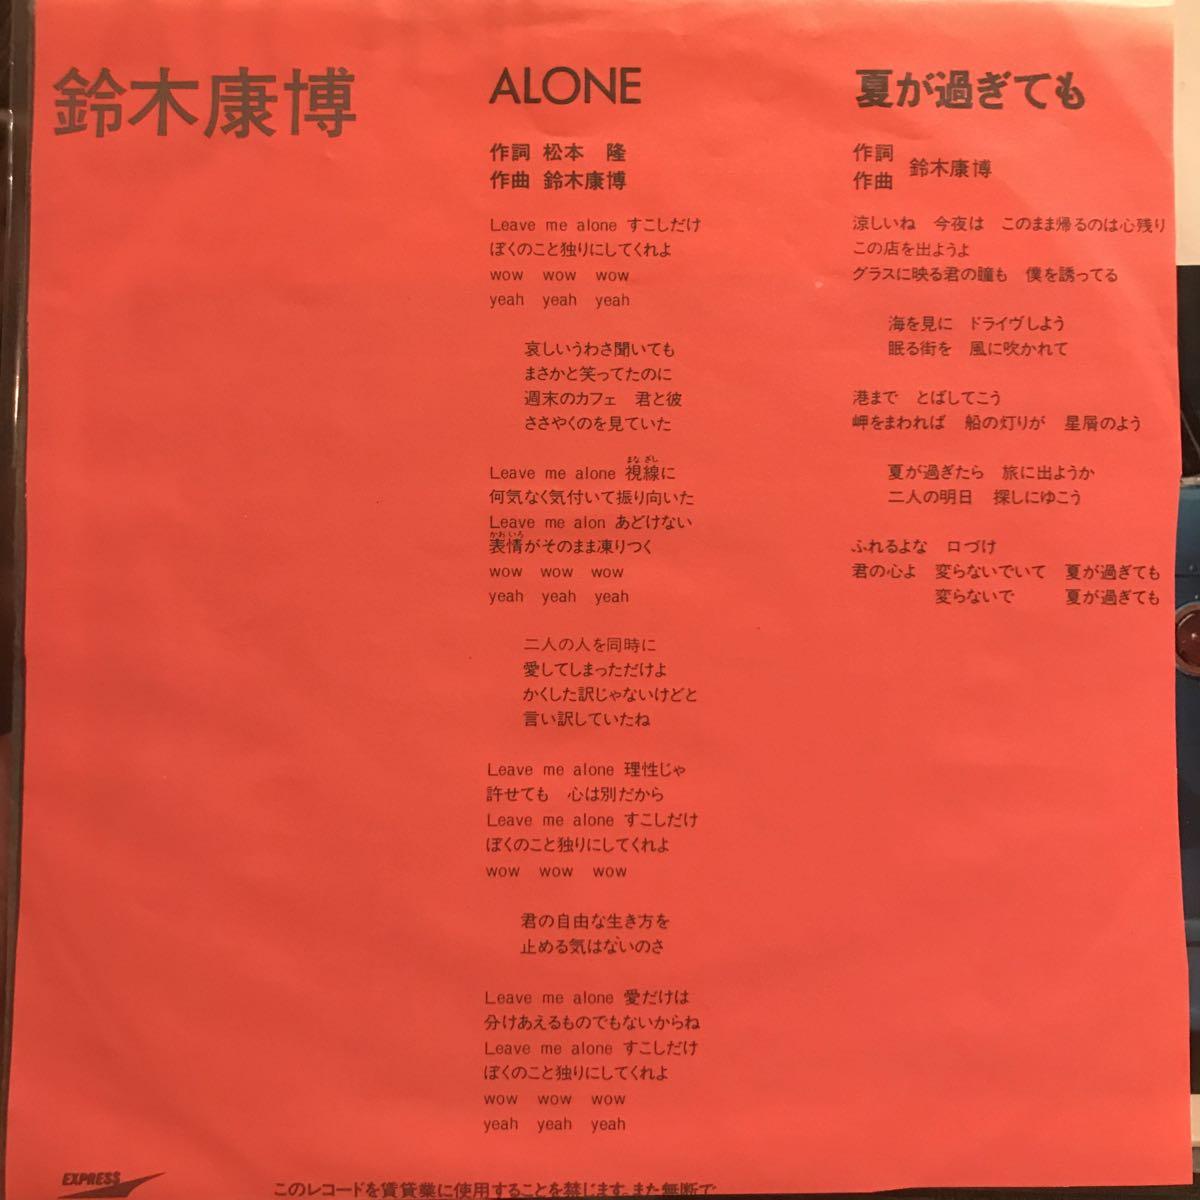 * EP【良品】非売品 見本盤 希少 和モノ 45s【 鈴木康博 】ALONE / 夏が過ぎても 松本隆 オフコース 1984年 歌詞カード付き_画像2